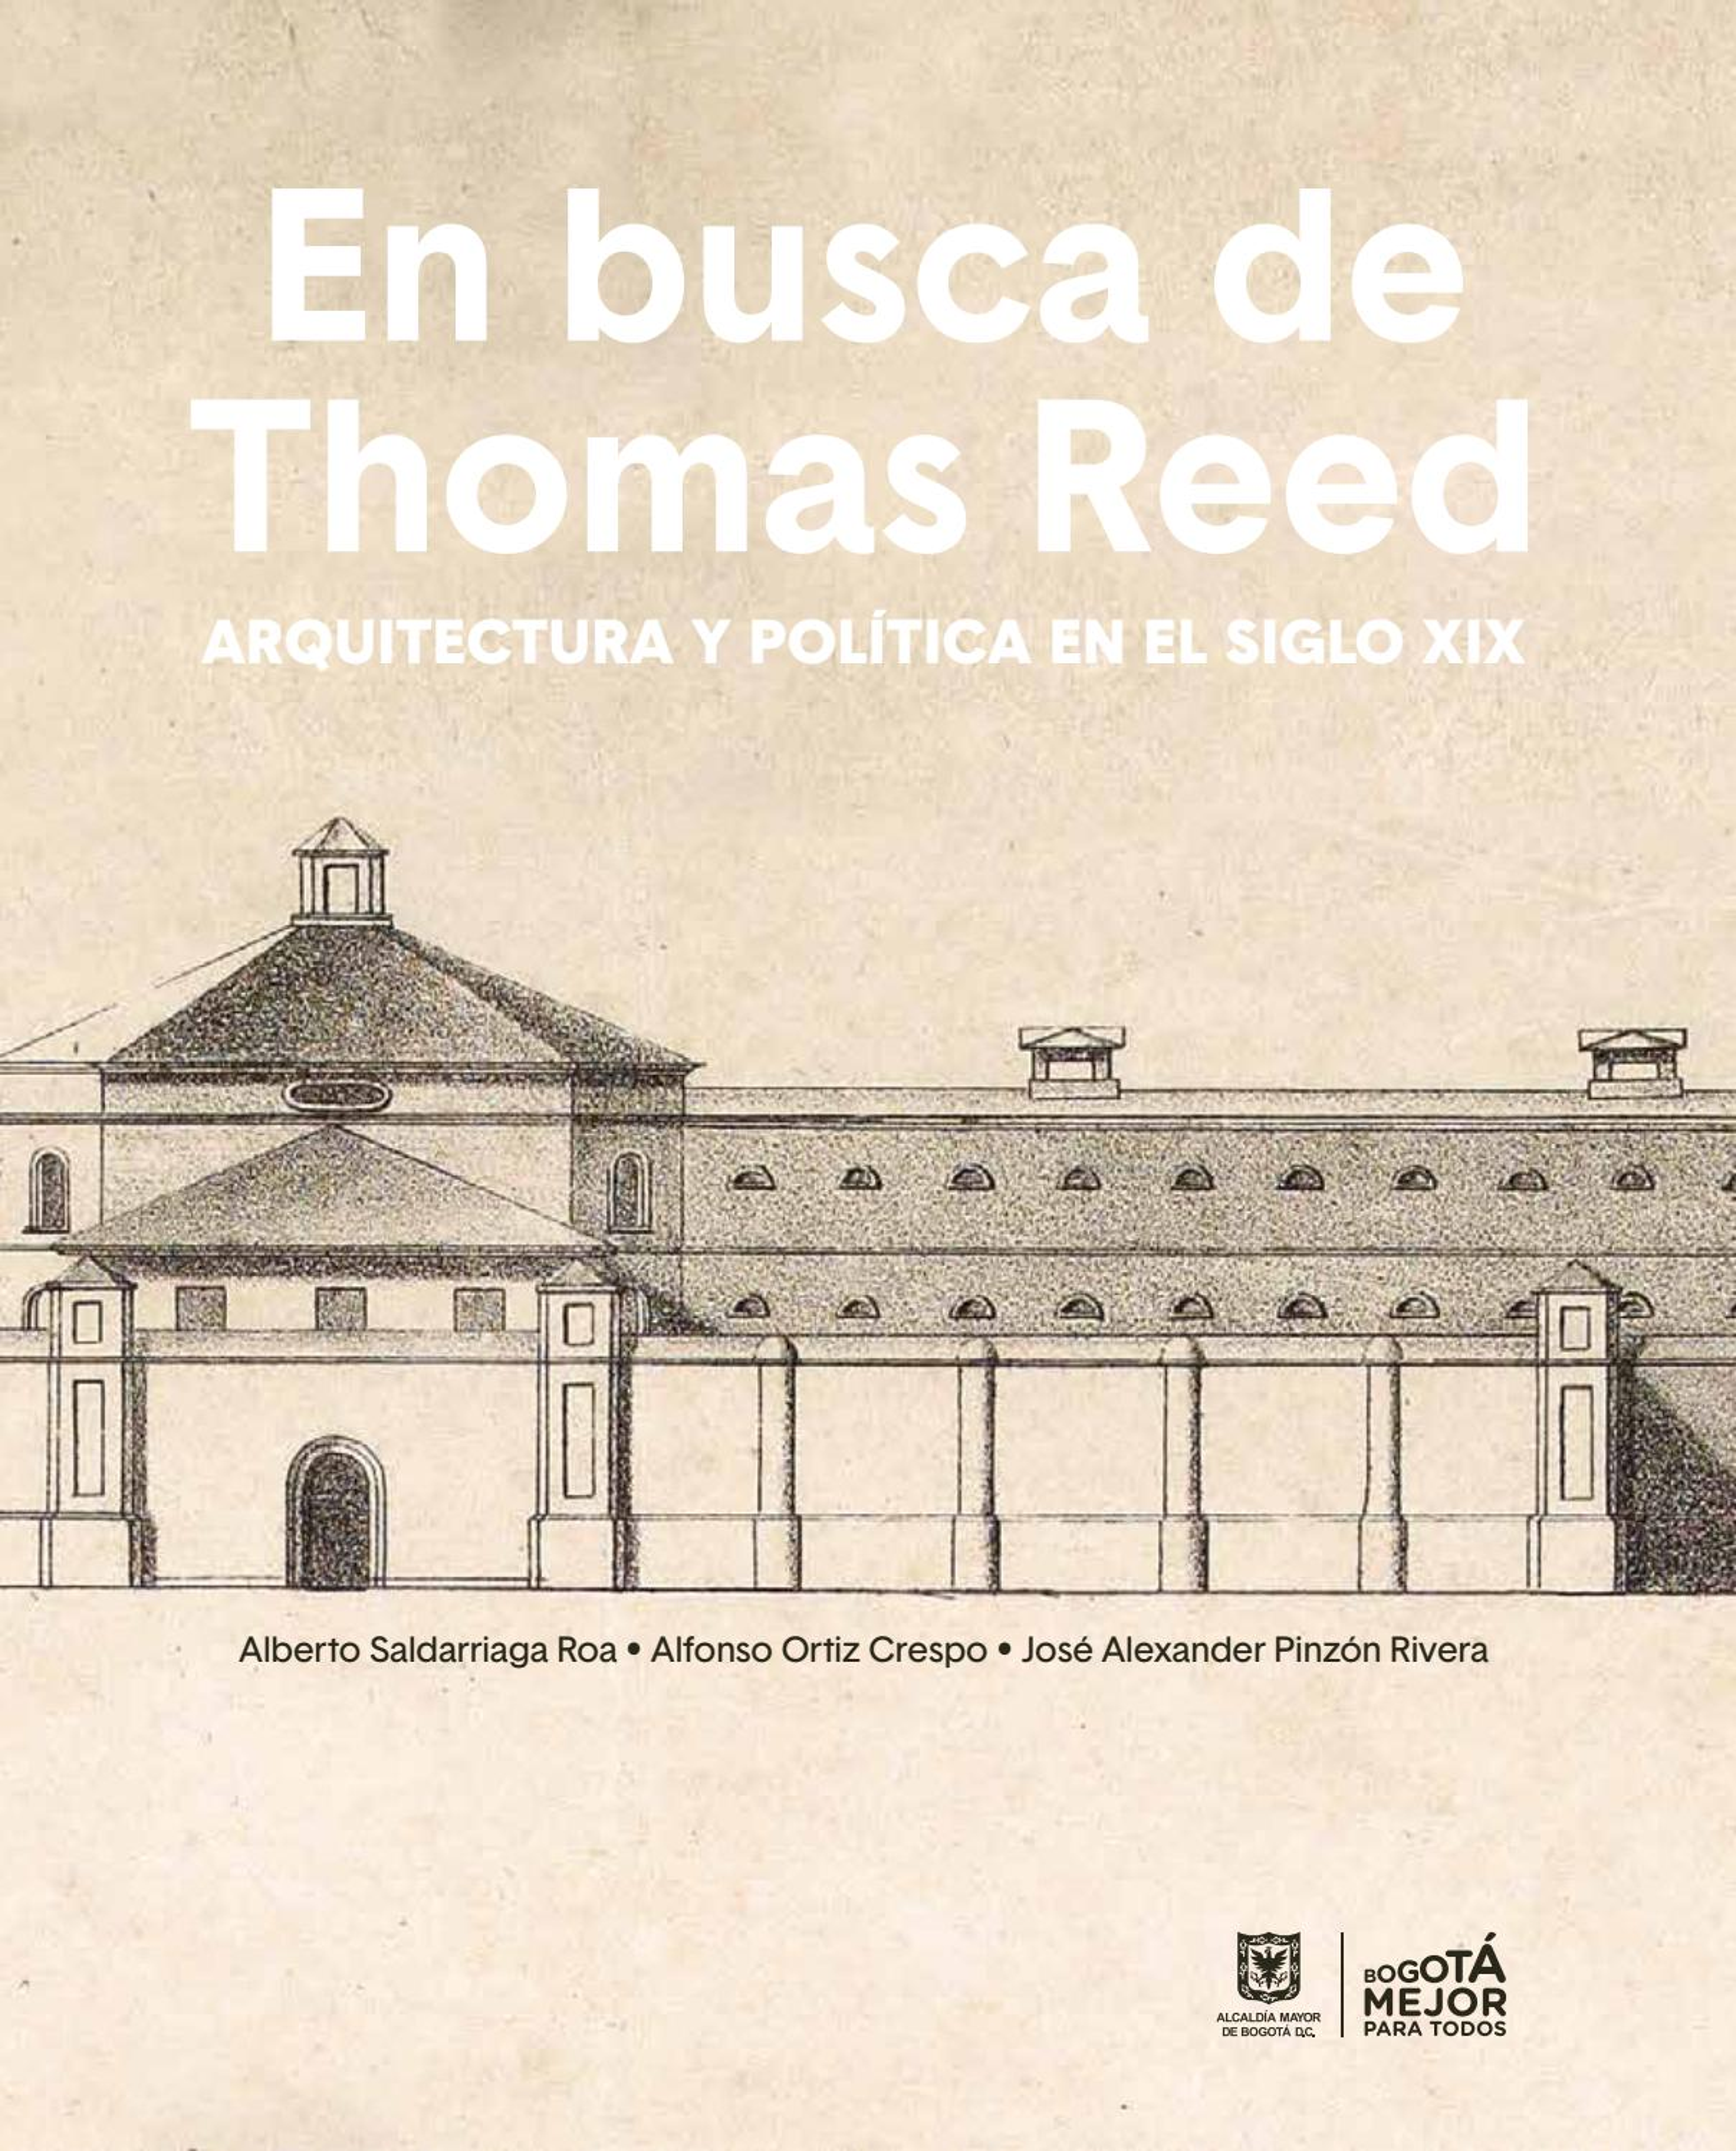 Thomas reed web by Instituto Distrital Patrimonio Cultural - issuu